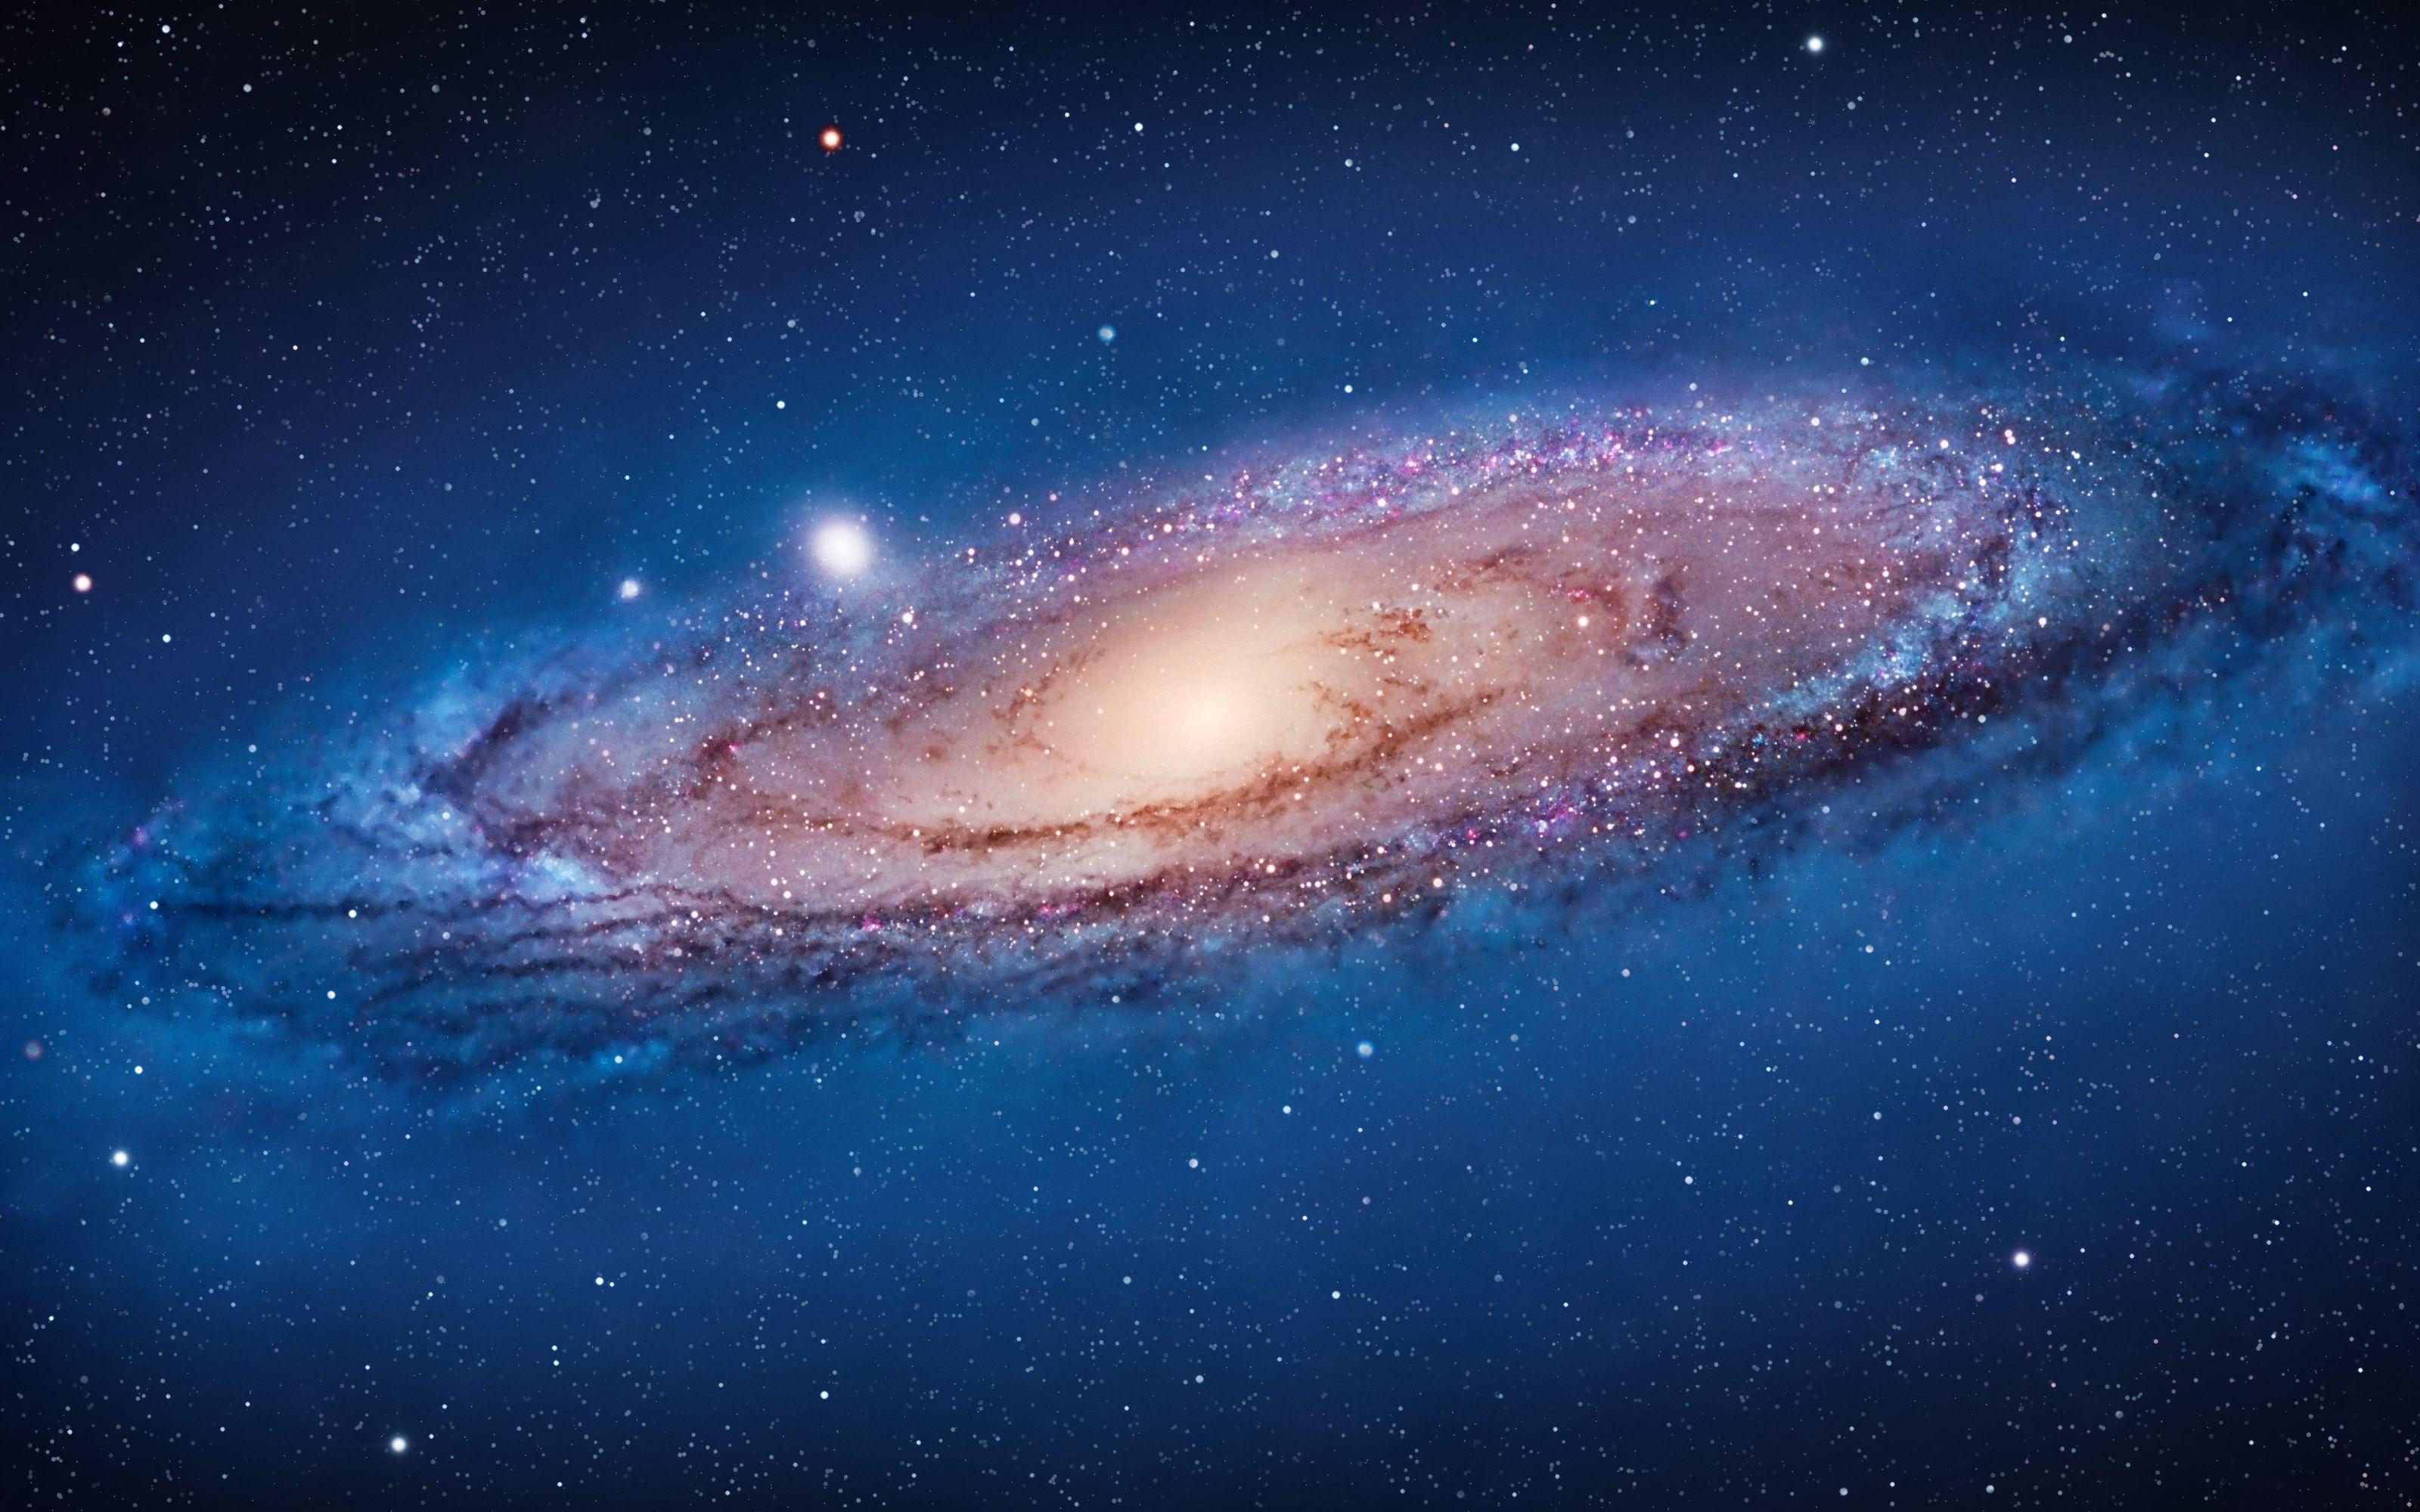 Andromeda Galaxy Wallpapers Top Free Andromeda Galaxy Backgrounds Wallpaperaccess